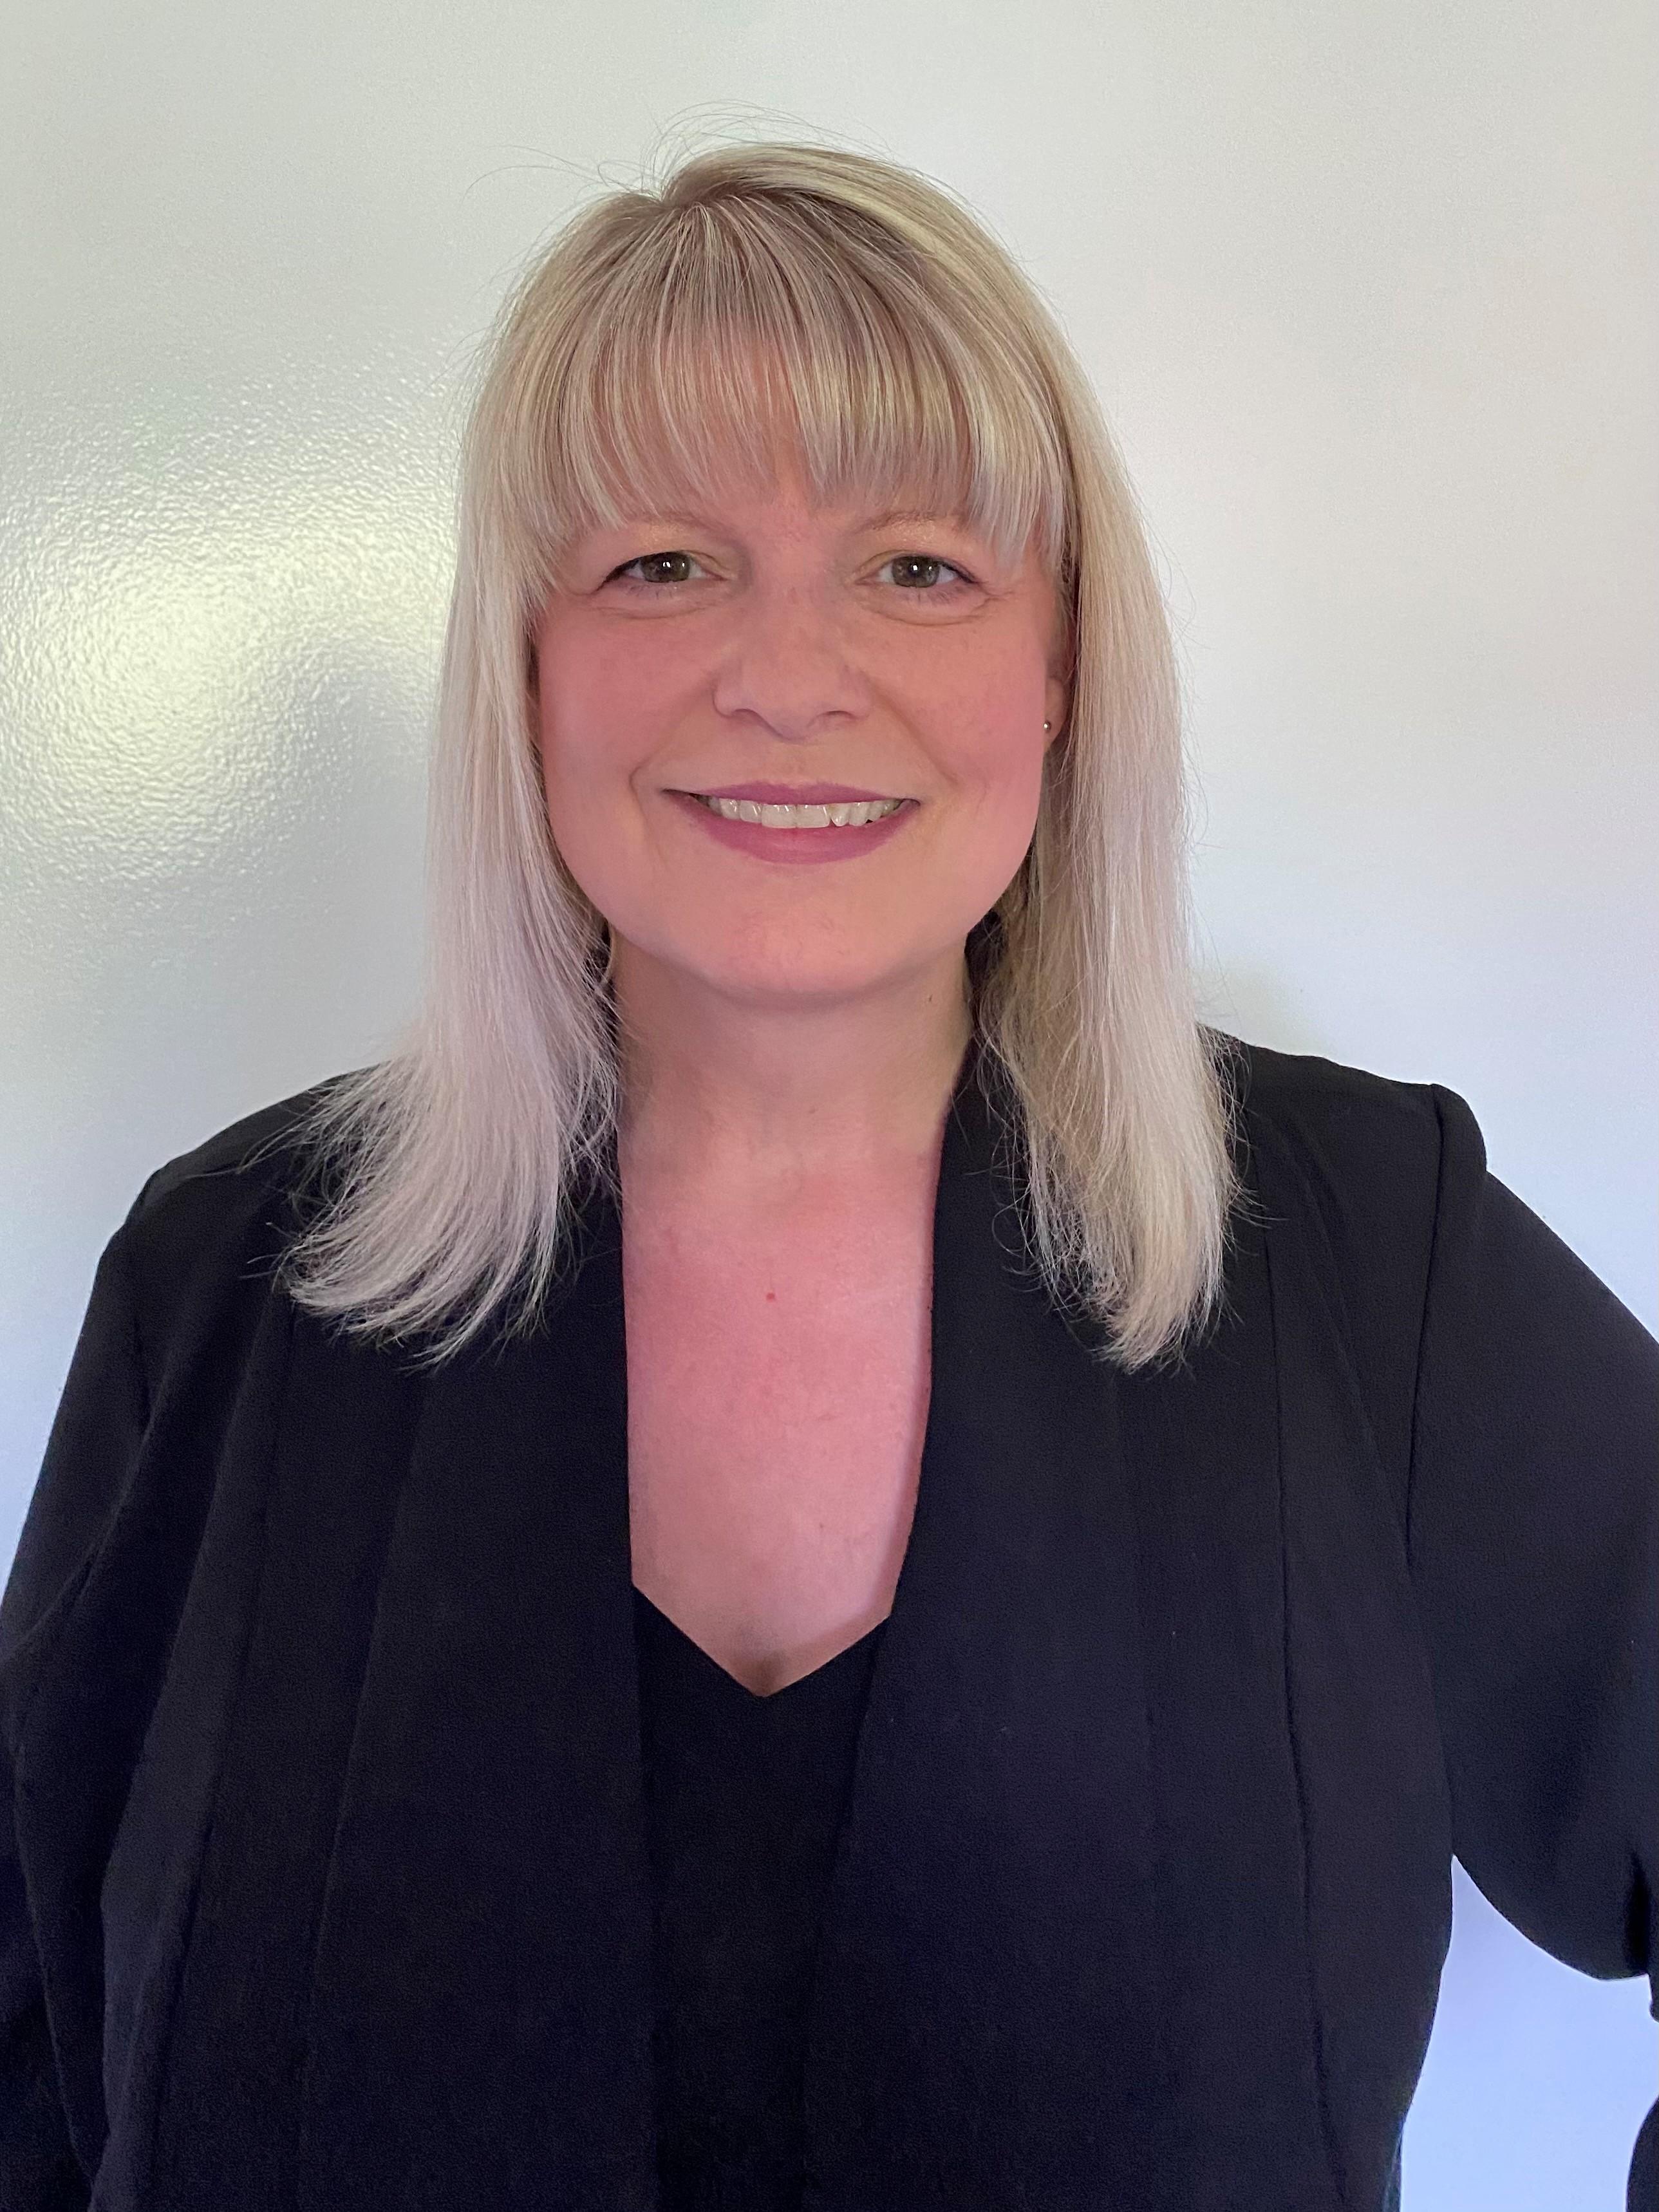 Kelly Perrow, Senior Manager, HRIS, CSA Group